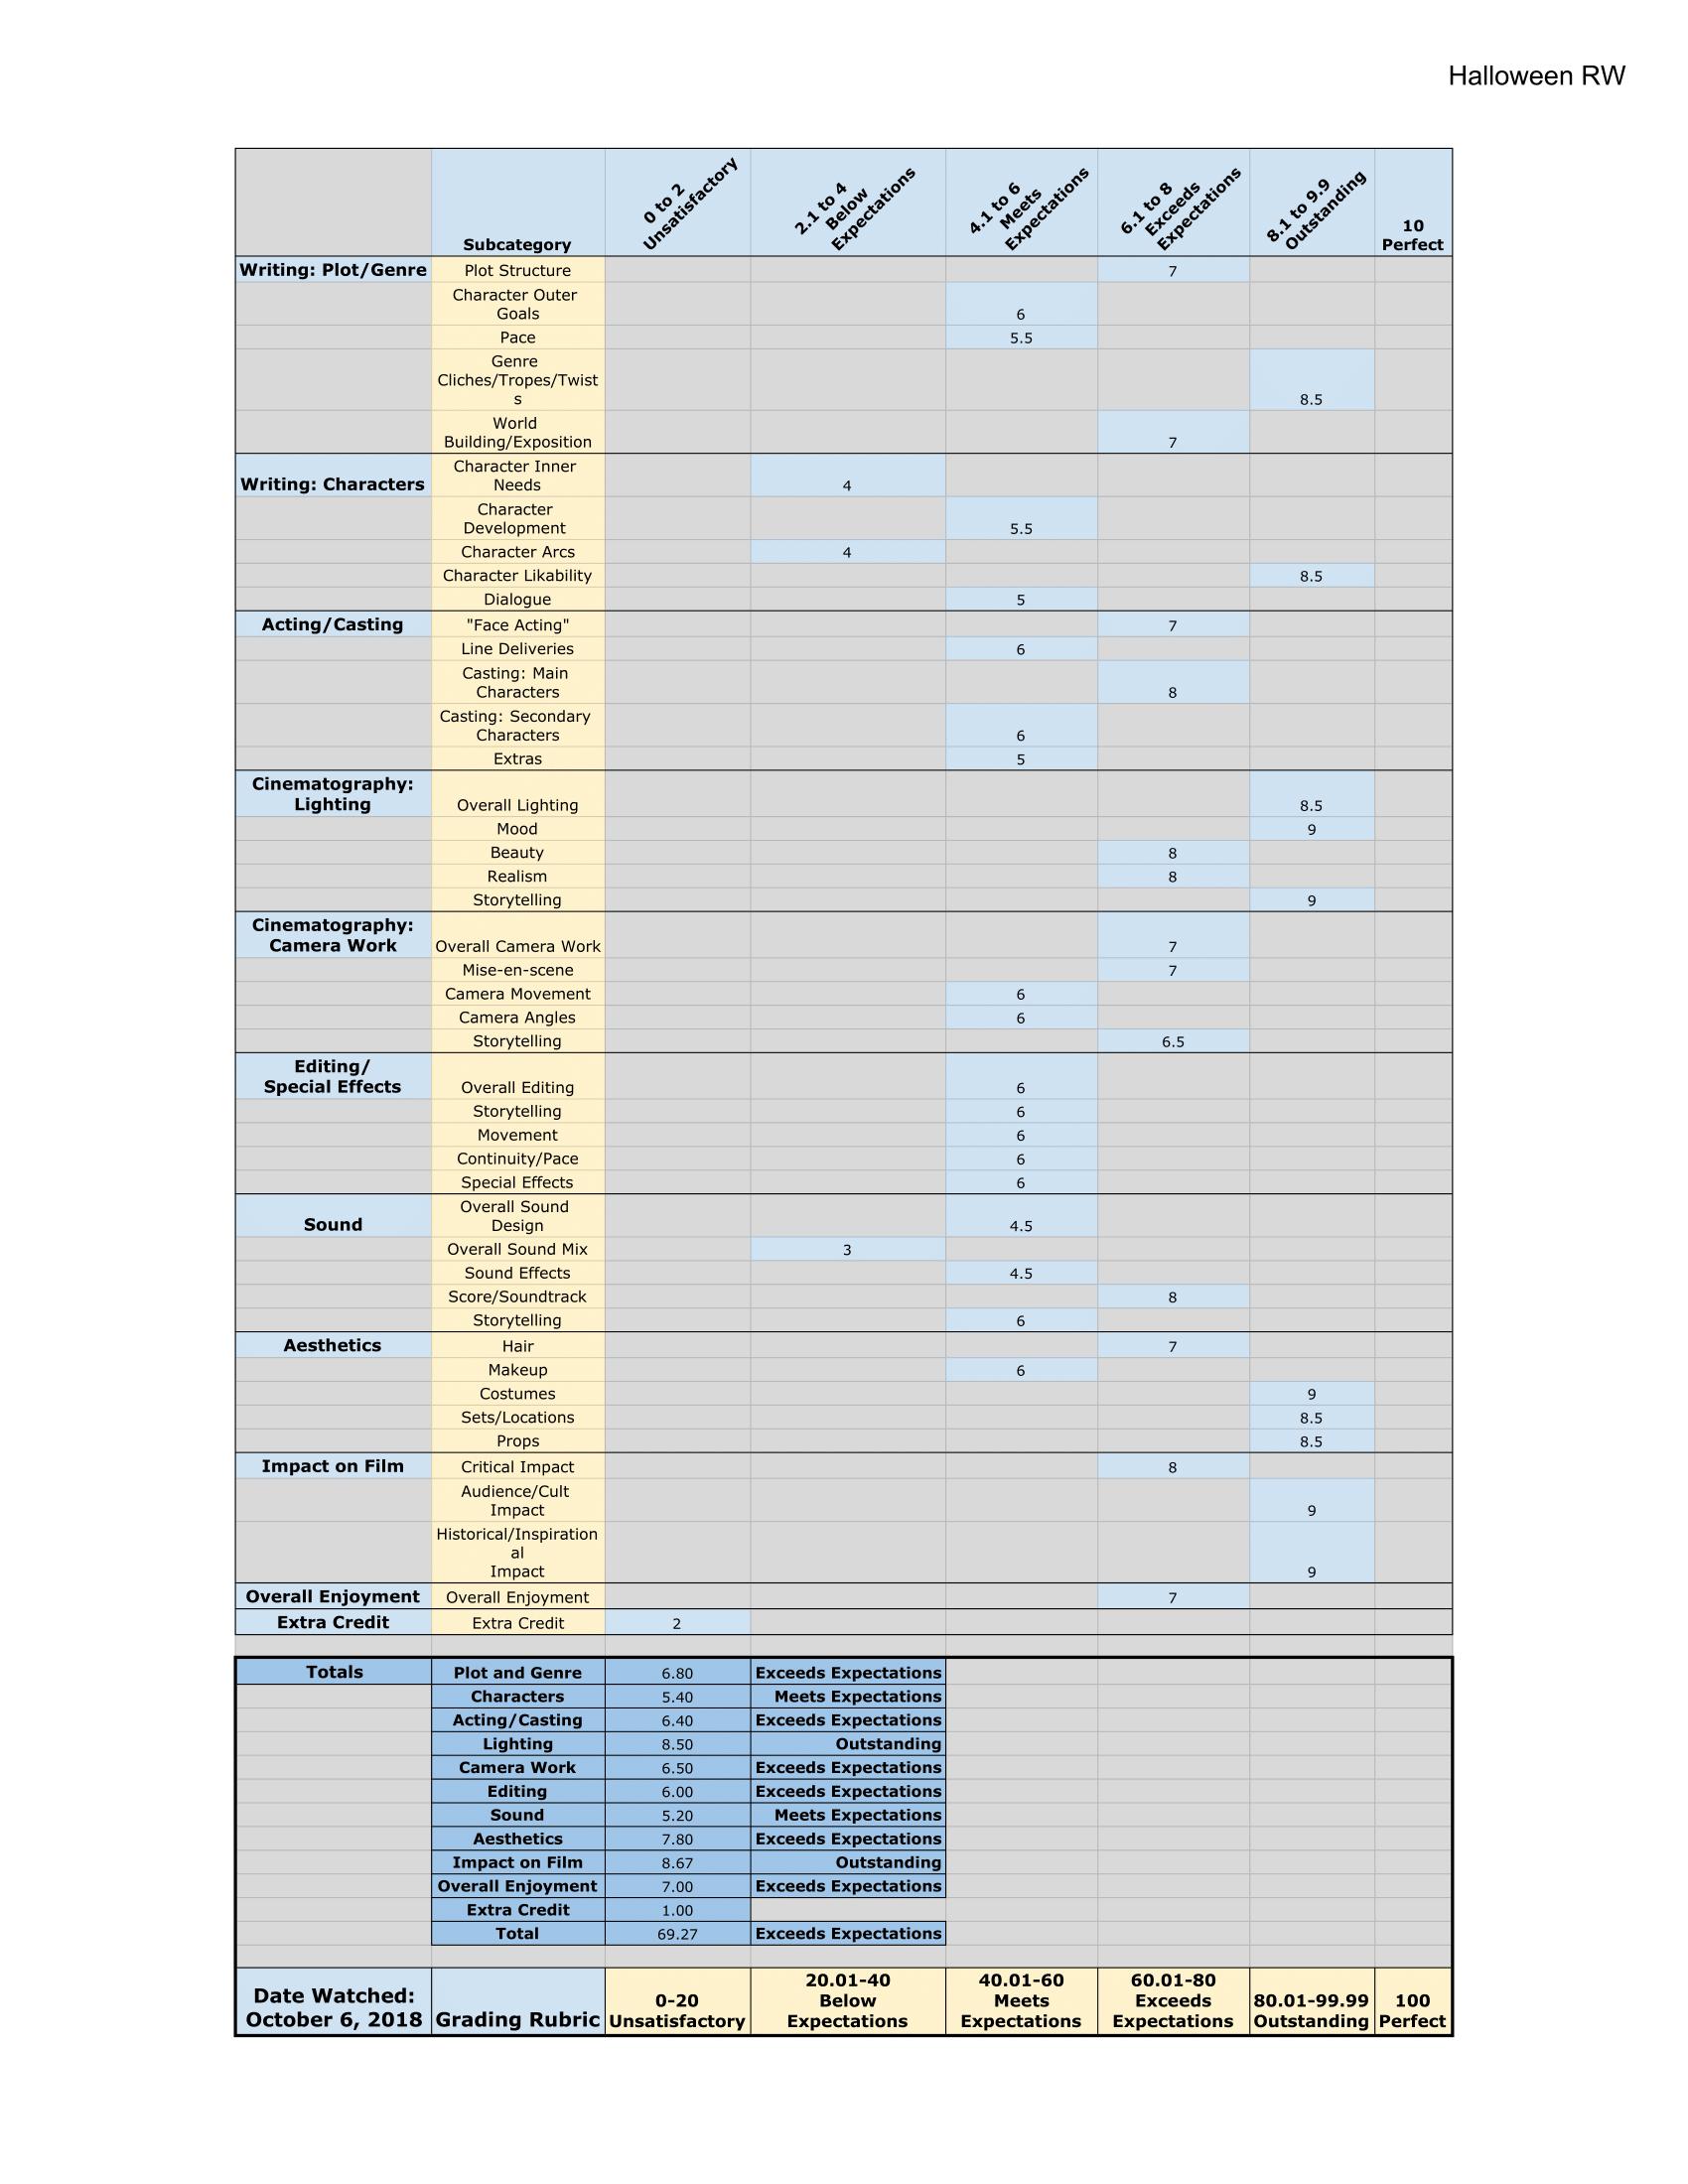 Untitled spreadsheet - Halloween RW-1.png